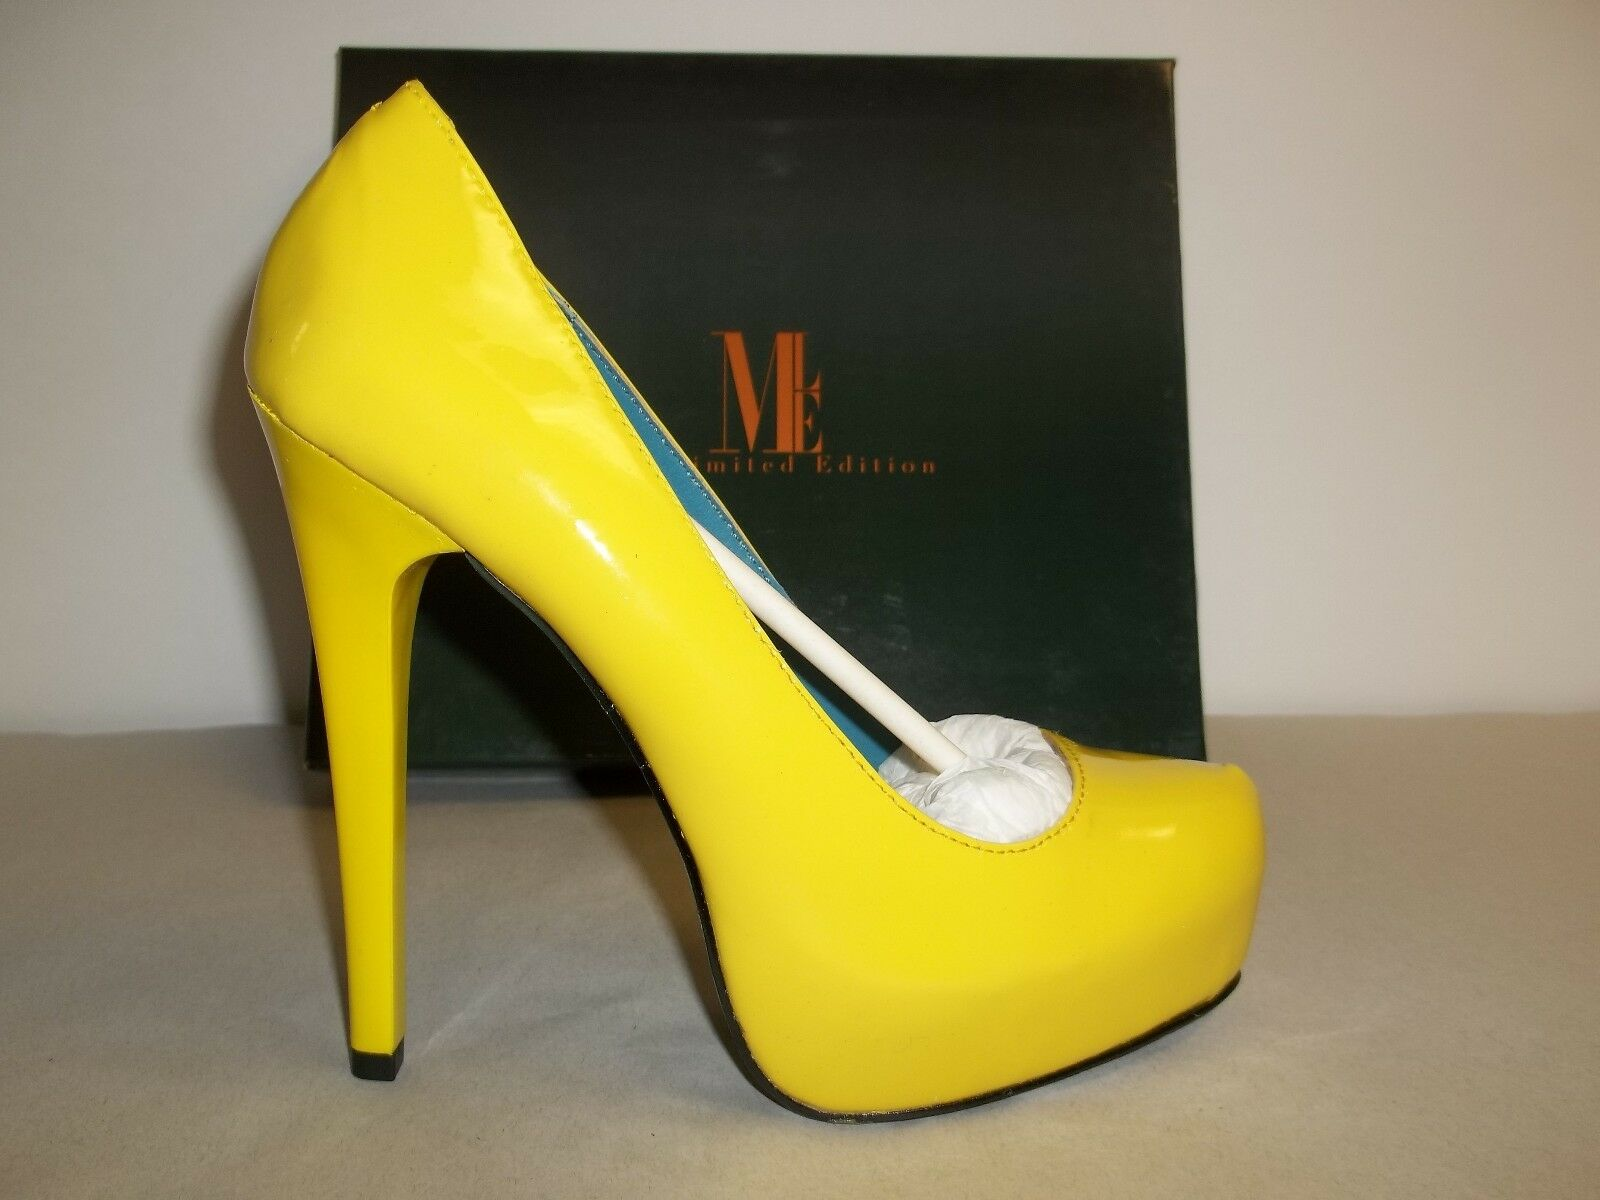 Mia Limited Edition Größe 9 M Vixen Yellow Lime Leder Pumps NEU Damenschuhe Schuhes